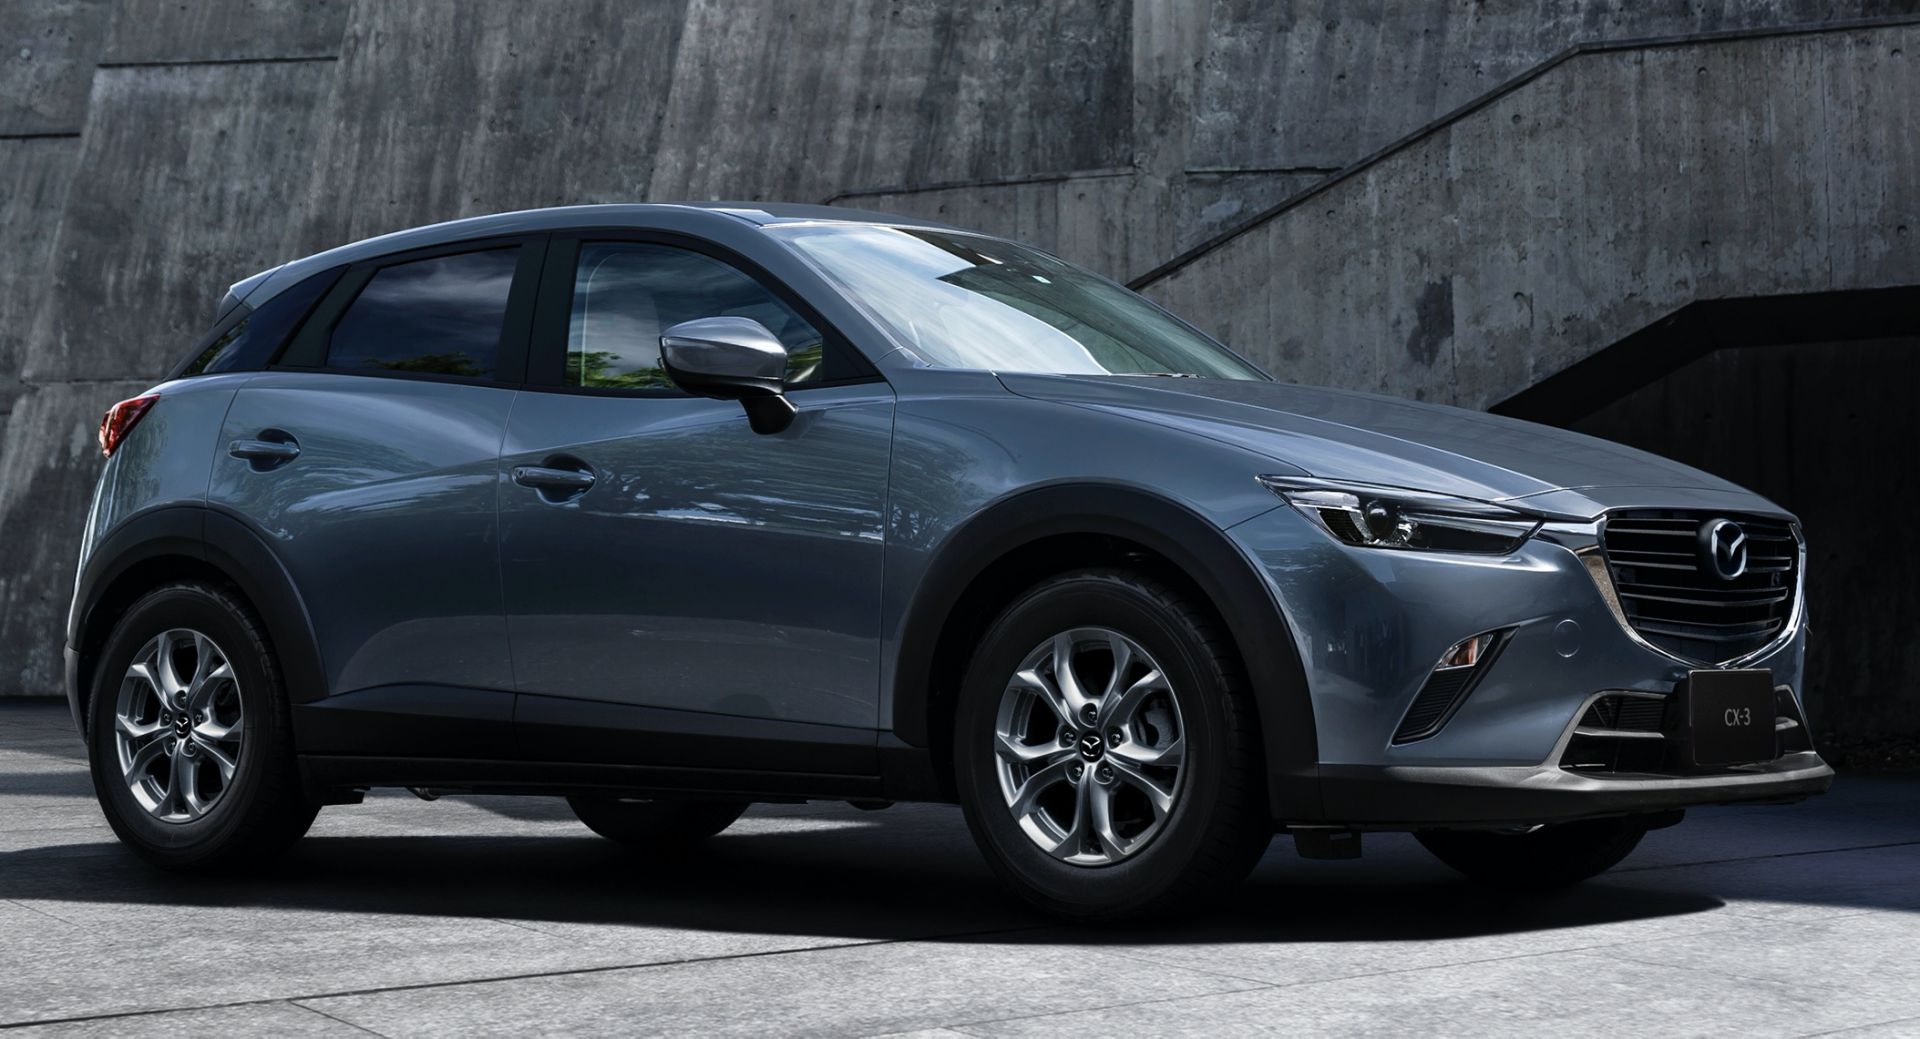 2020 Mazda CX-3 Spesification